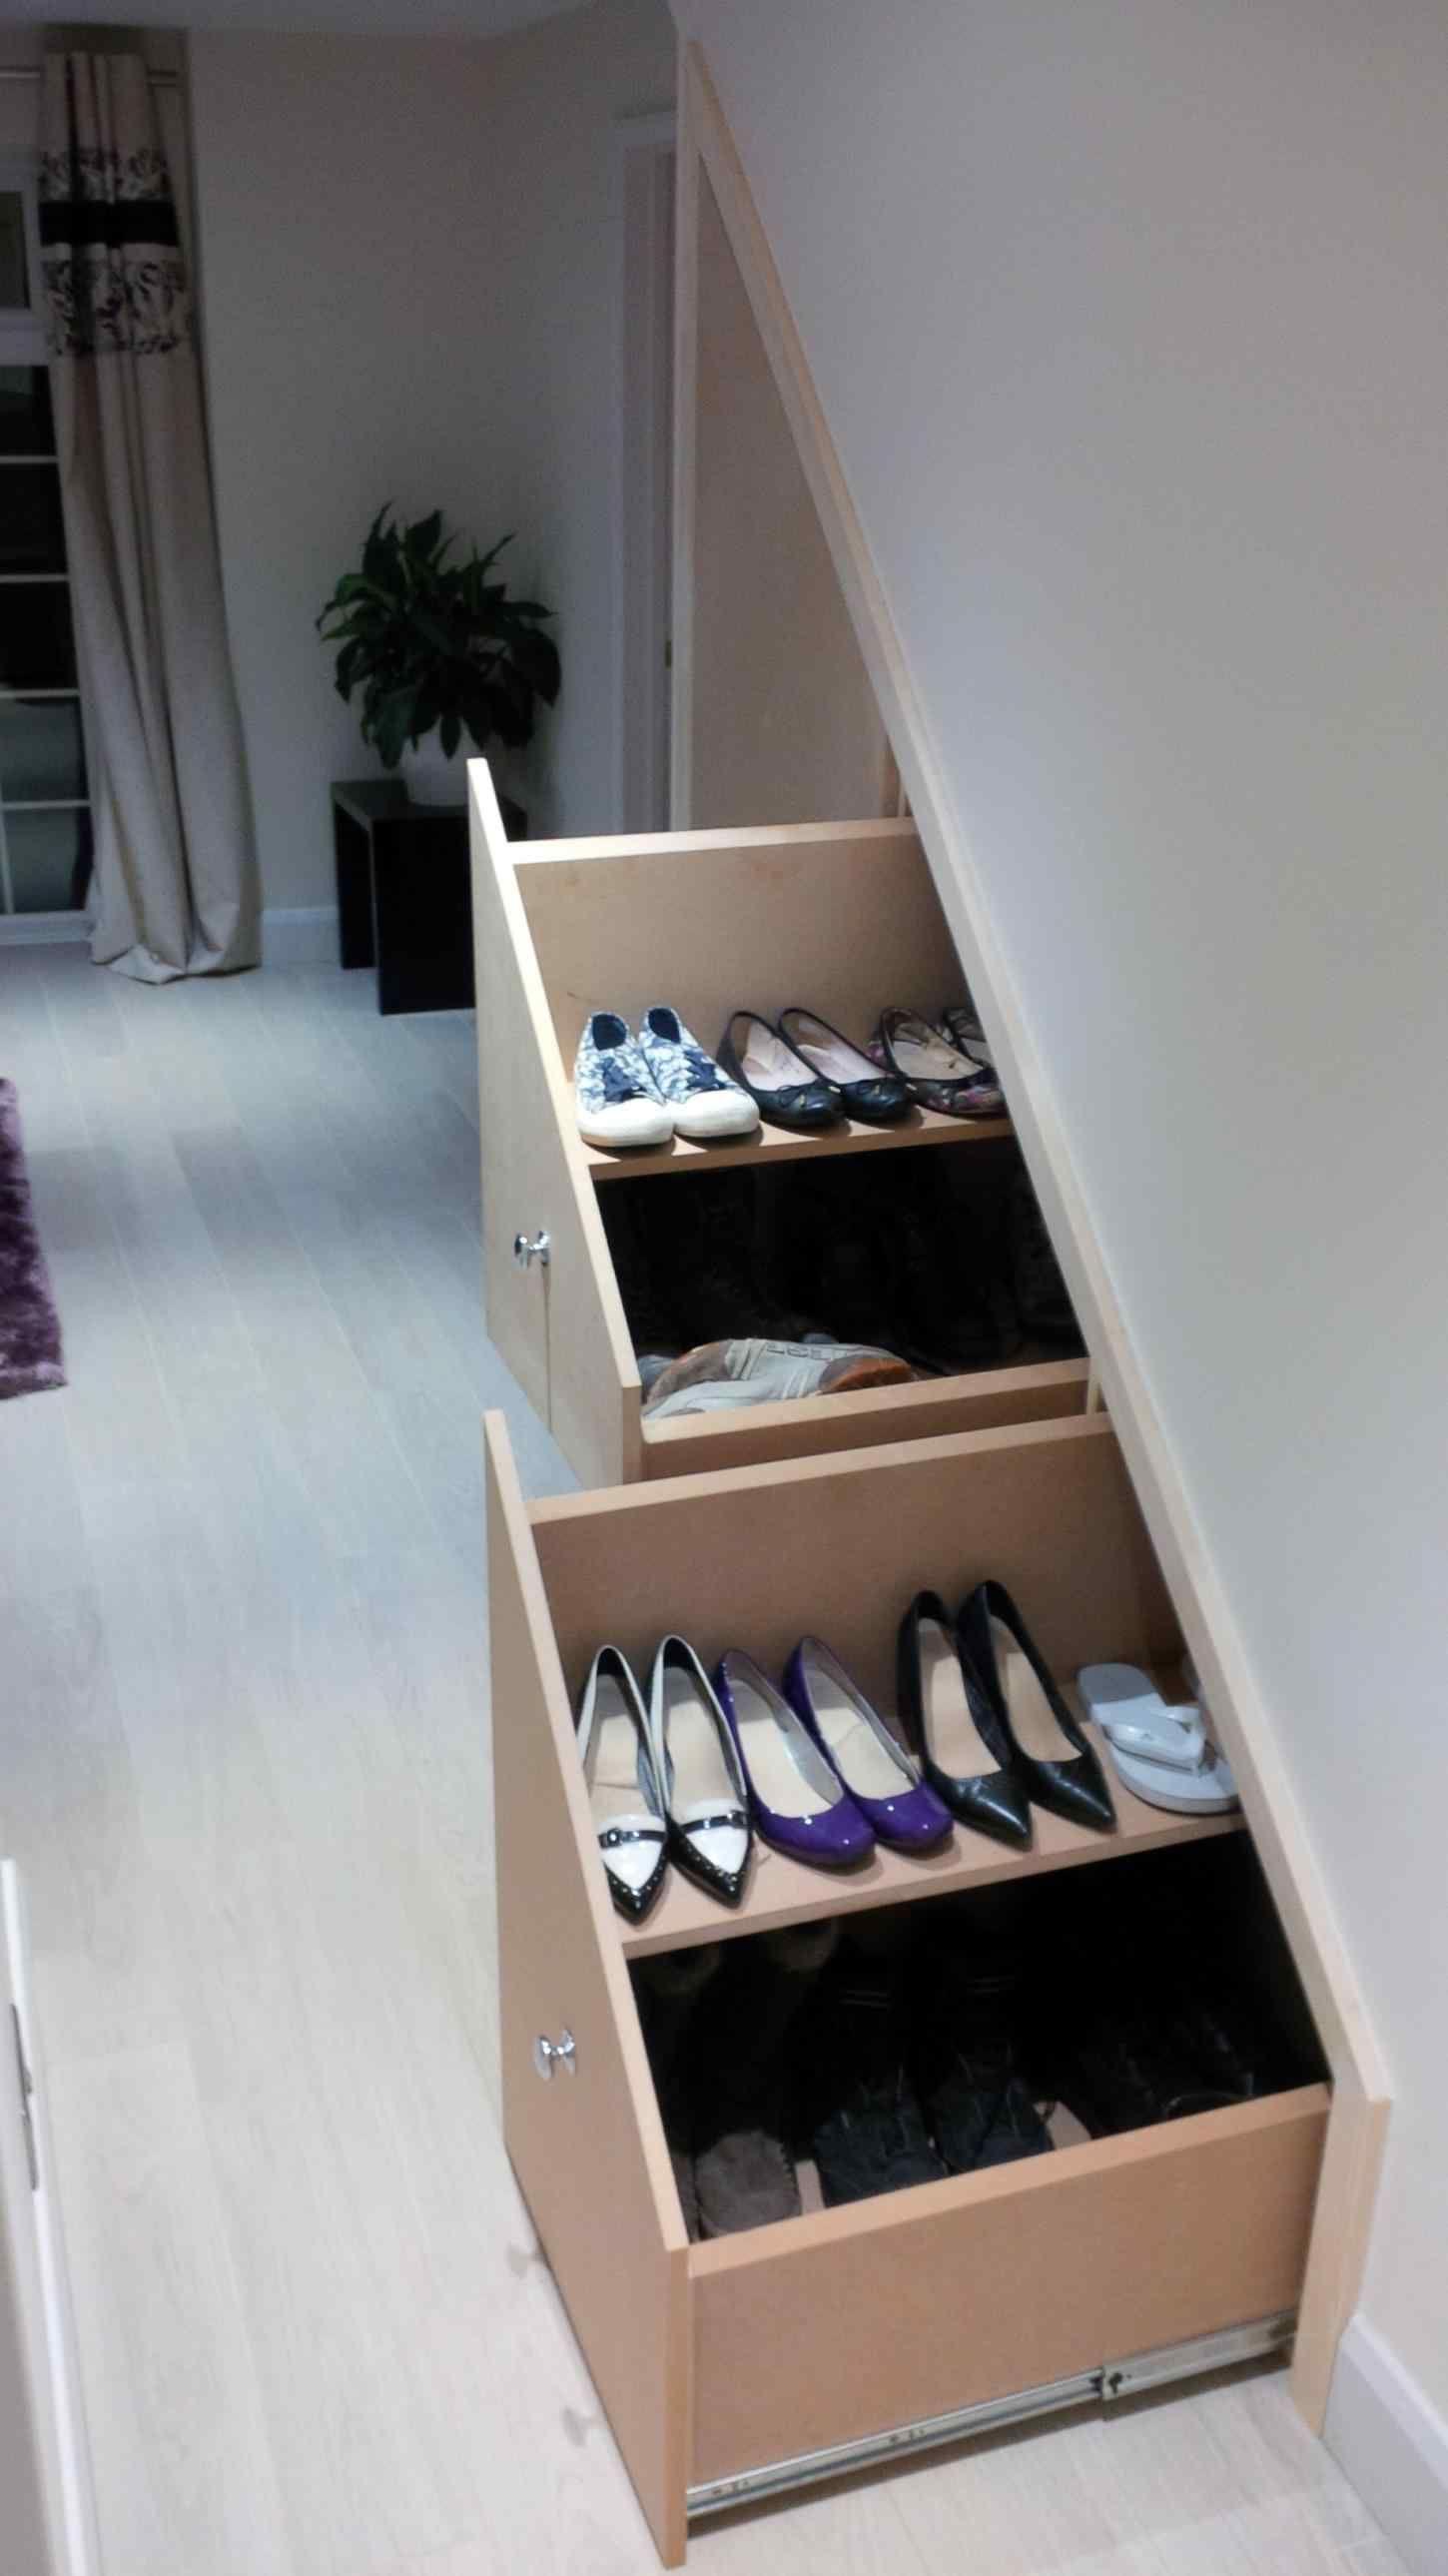 Pull Out Shoe Shelves Hanging Shoe Rack Shoe Drawer Shoe Shelves